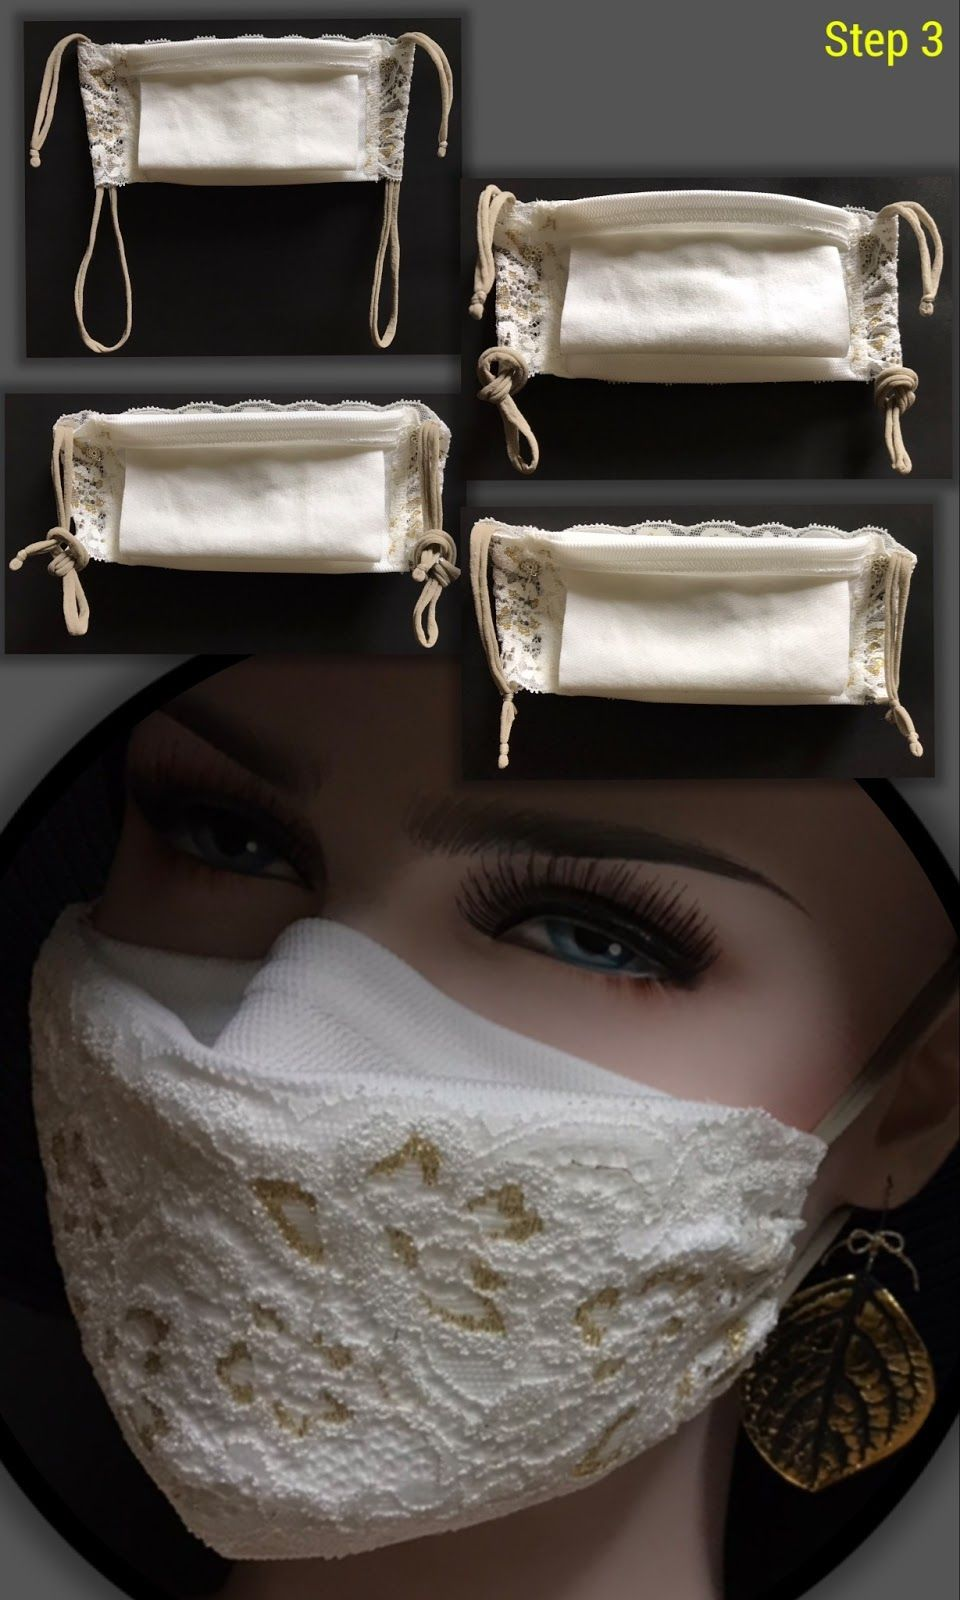 Face mask diy in 2020 Face mask, Diy face mask, Diy mask